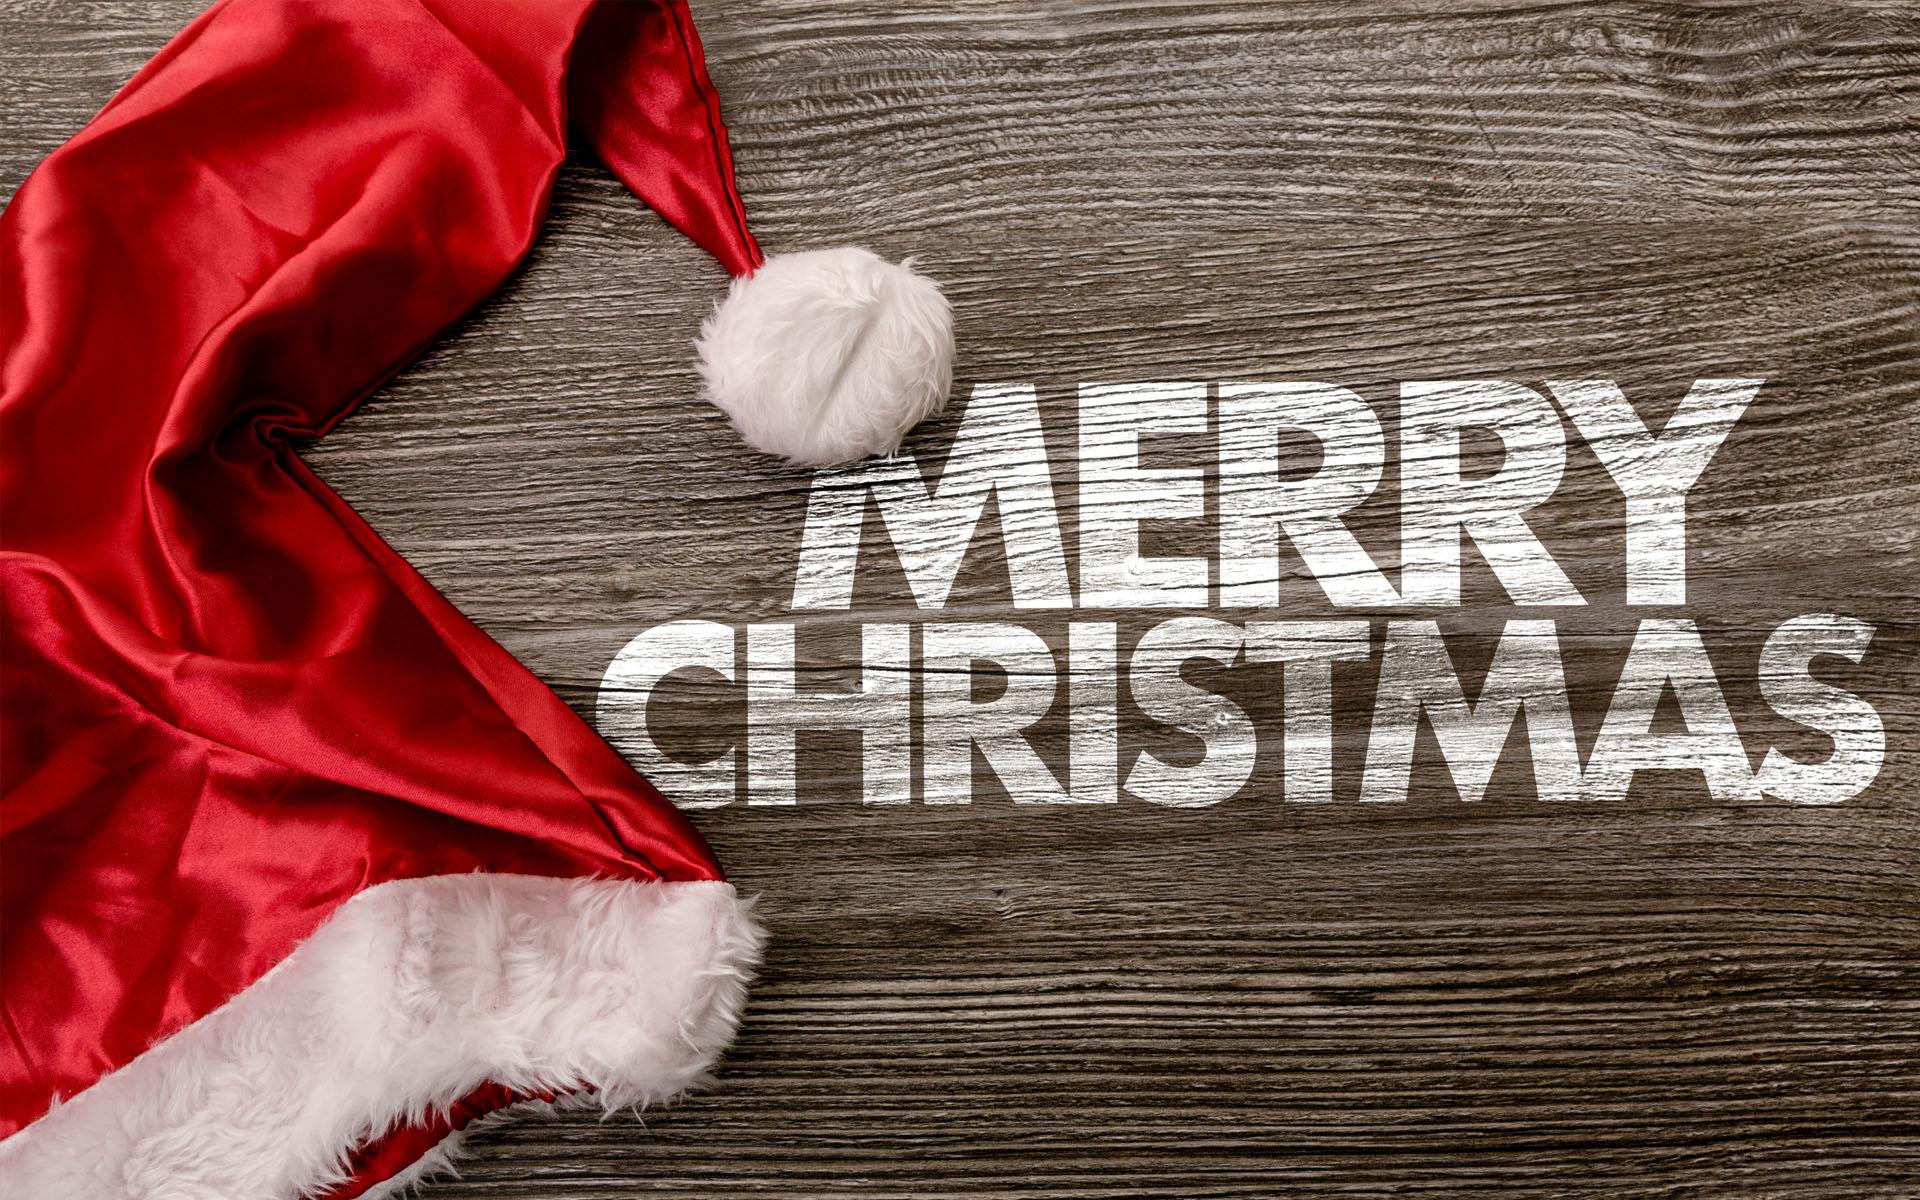 Top 10 Best Merry Christmas Wallpapers 2016-17 [HD Download]